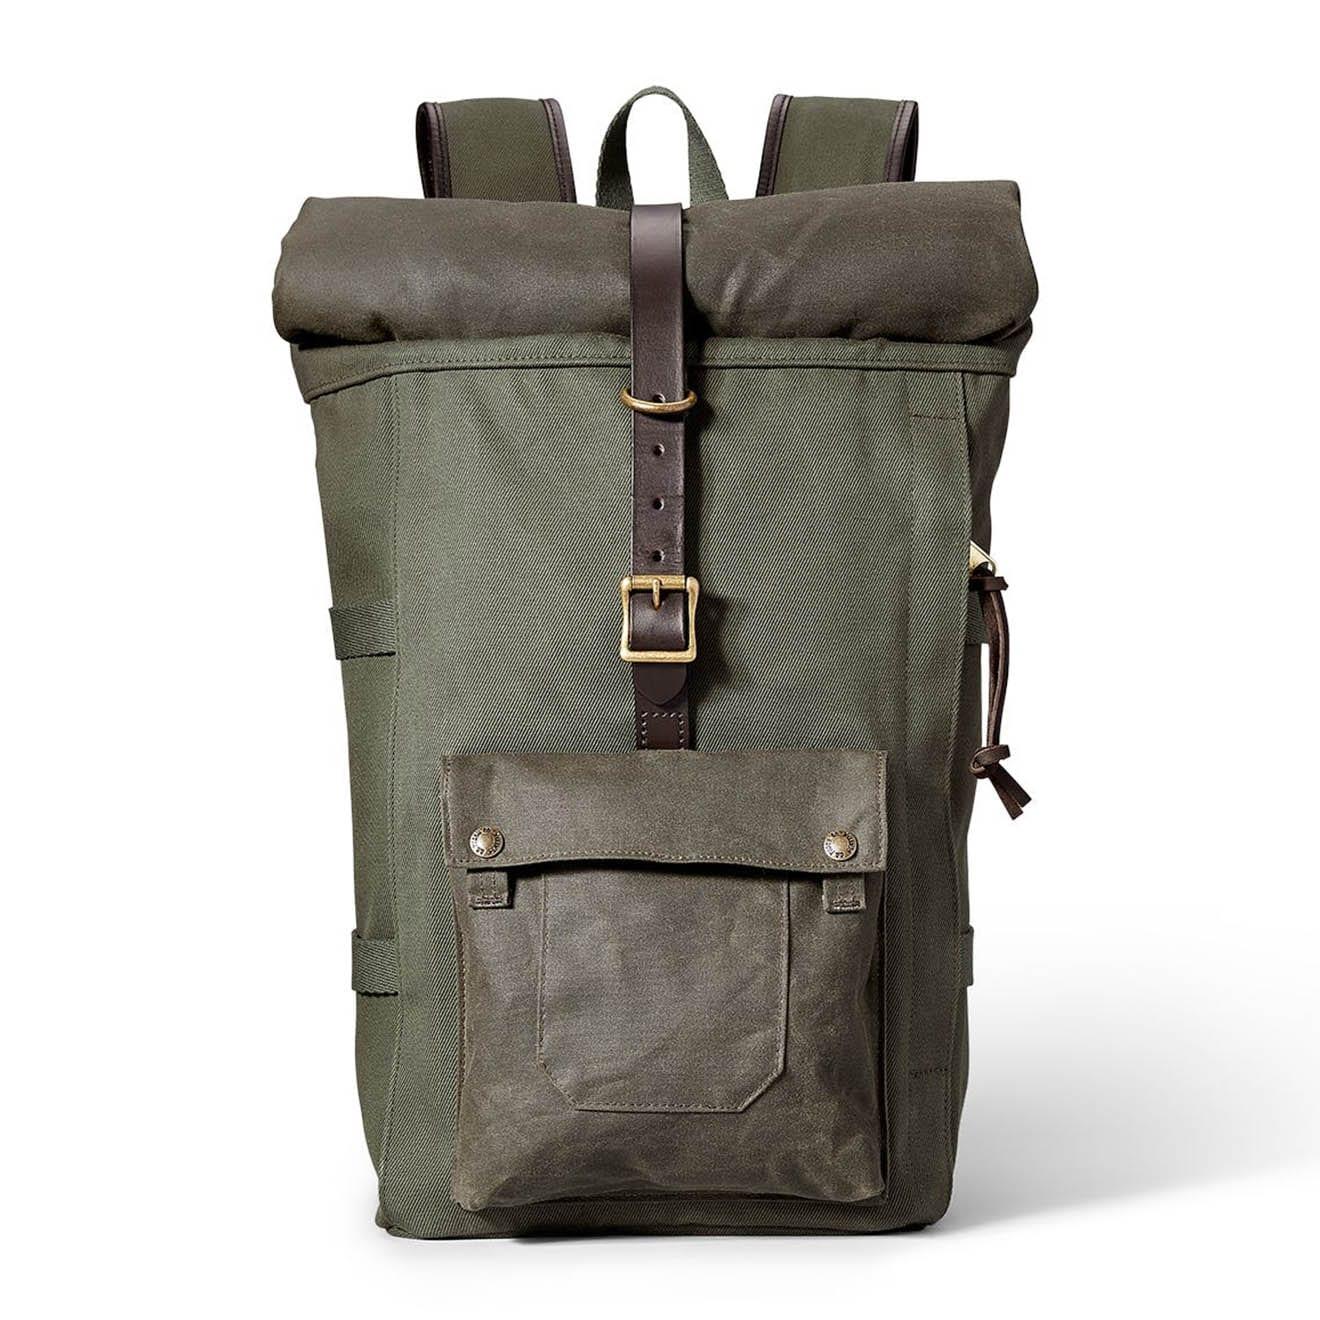 Filson Rolltop Backpack Otter Green